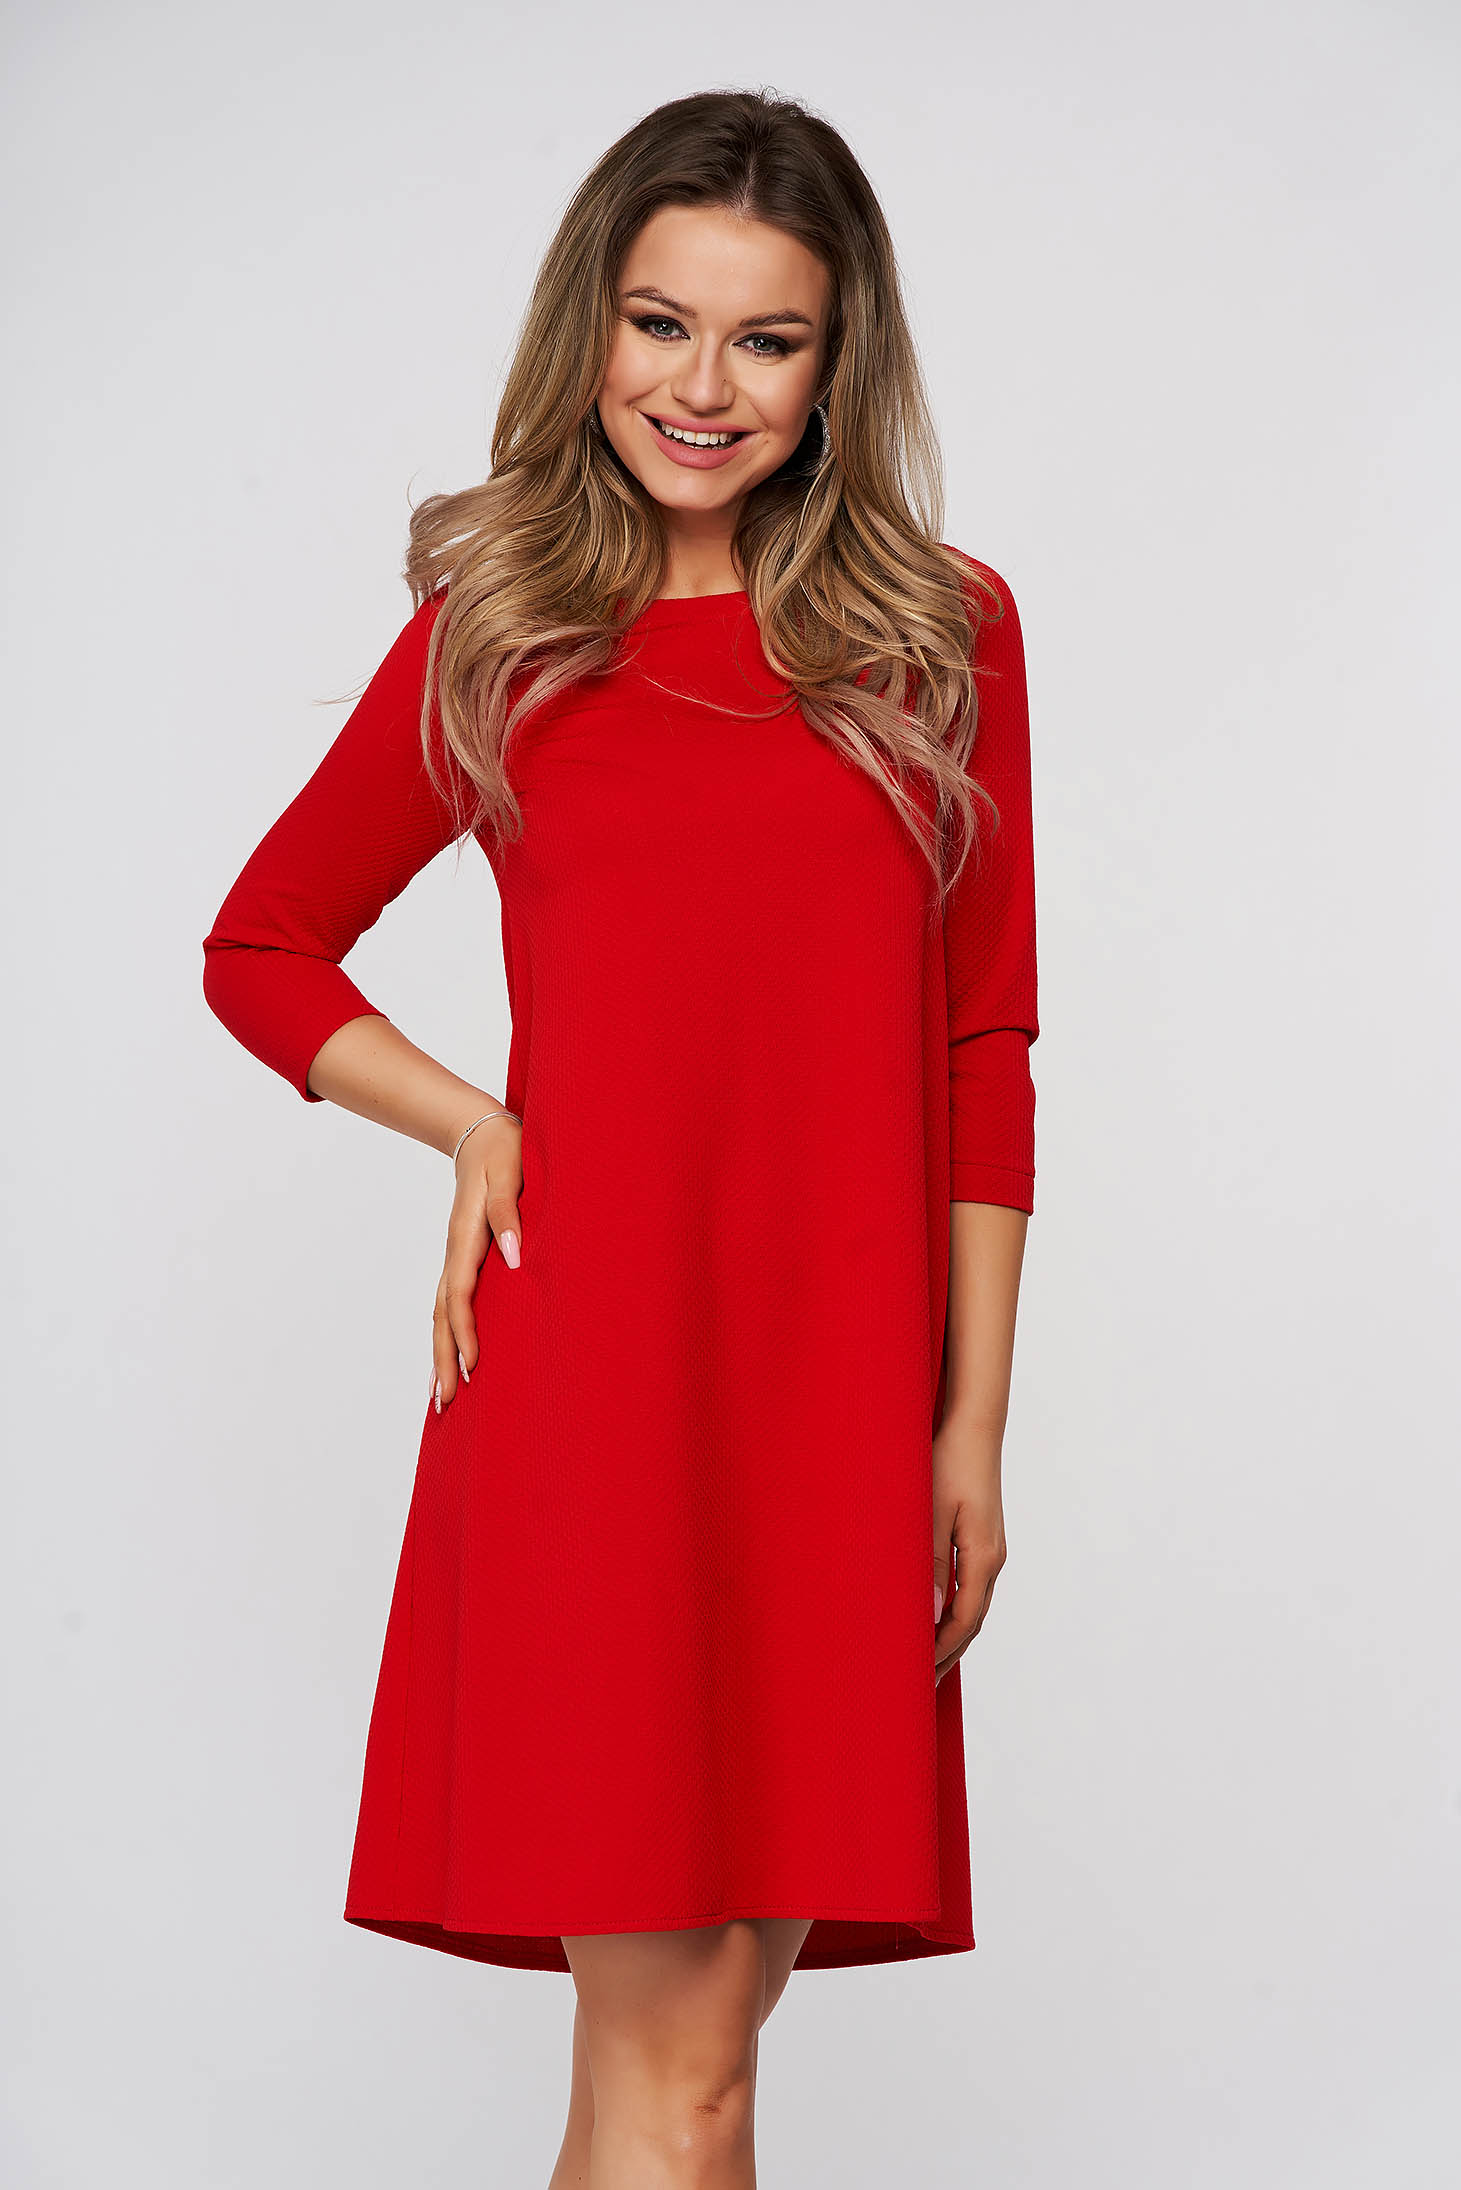 Piros bő szabású rövid StarShinerS ruha rugalmas anyagból